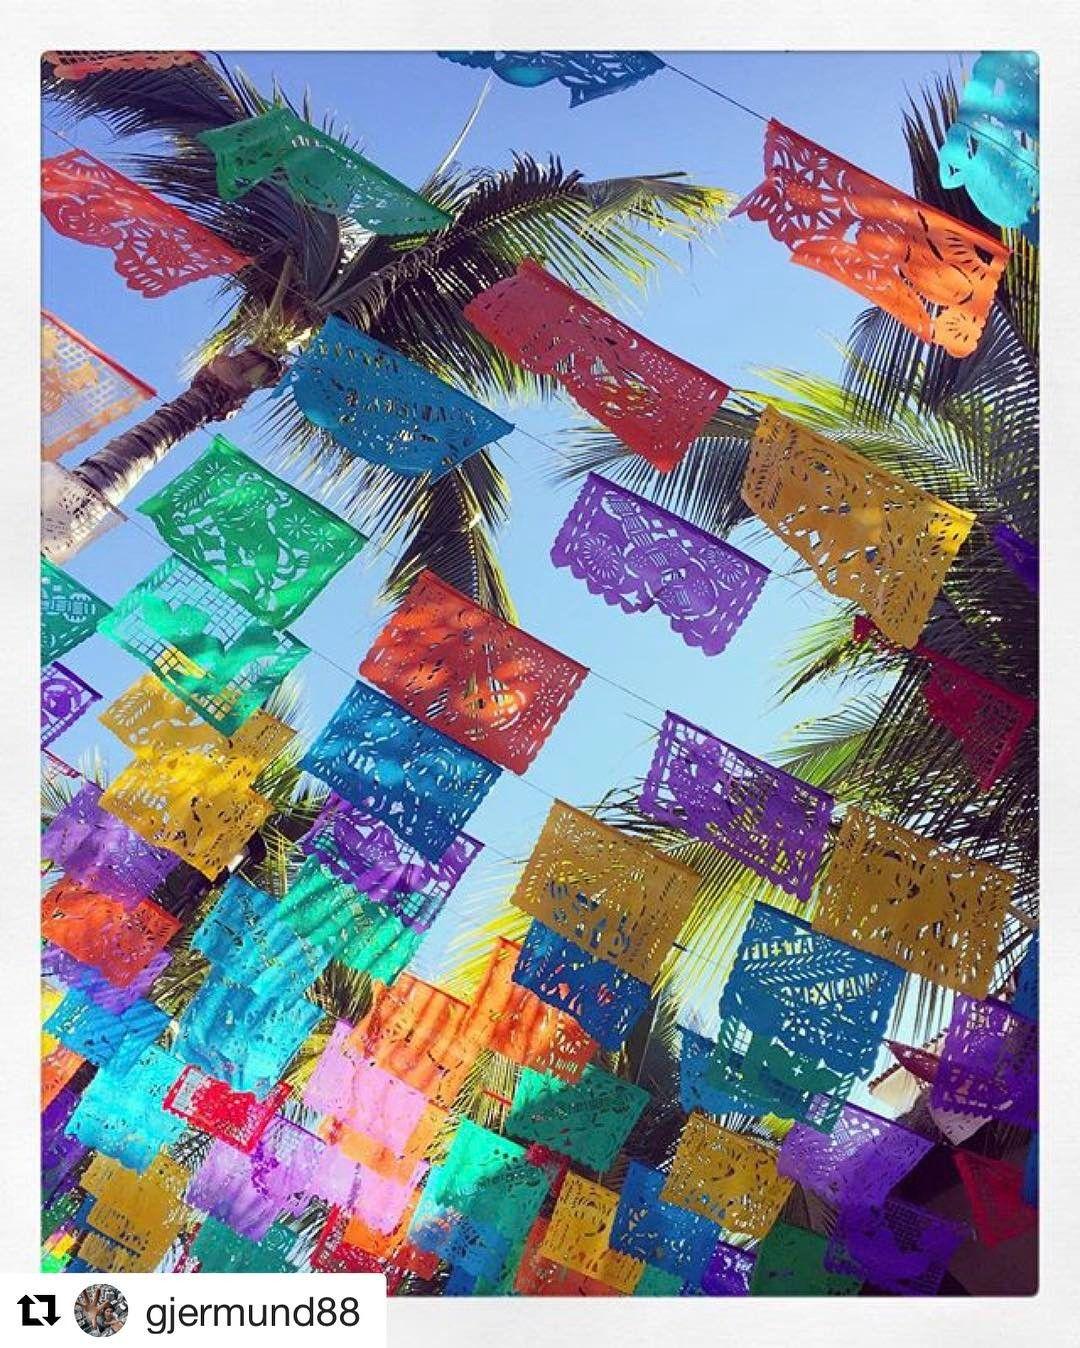 Fiesta på Sayulita i Mexico. #reiseblogger #reisetips #reiseliv  #Repost @gjermund88 with @repostapp  #mexican #fiesta #sayulitas #colorful #colors #instaparty #fest #stemning #atmosphere #passion #passionpassport #mytripmyadventure #travelgram #reiseradet #vivamexico #nåvilæfærratilmexico #gjermund88photography